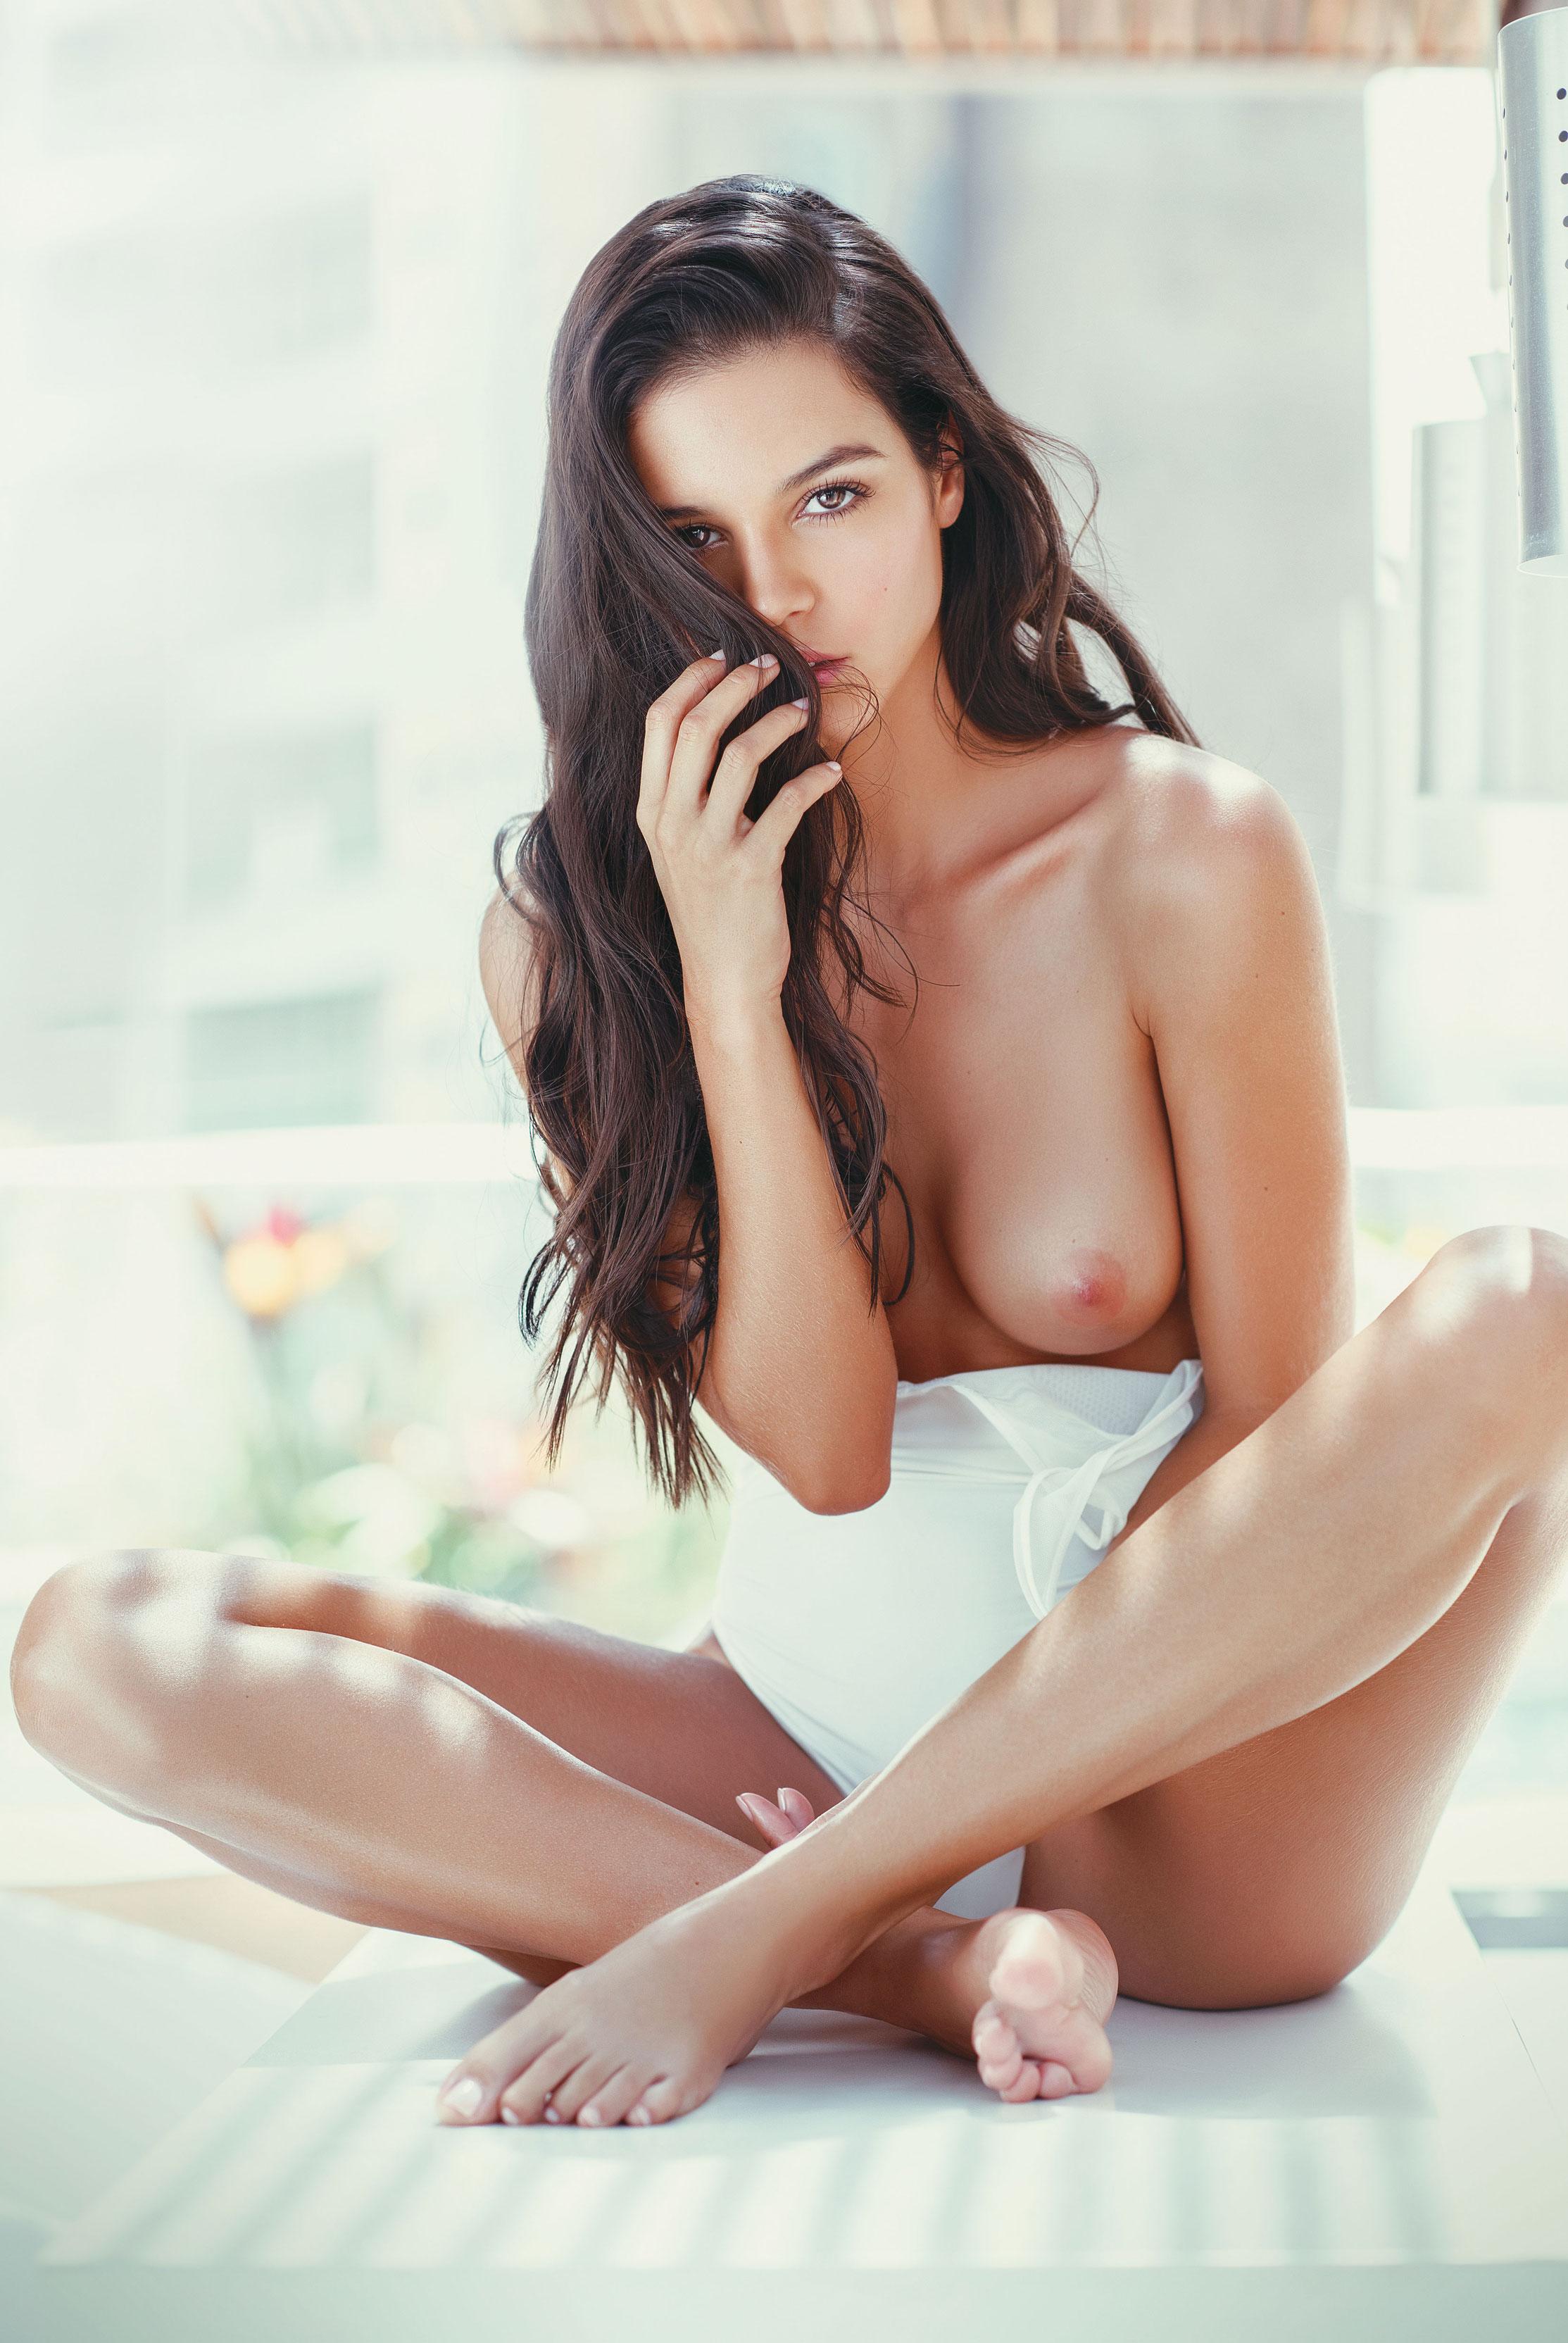 Мария Фернанда Мюриэль / Maria Fernanda Muriel nude by Felipe Bohórquez - SoHo Magazine